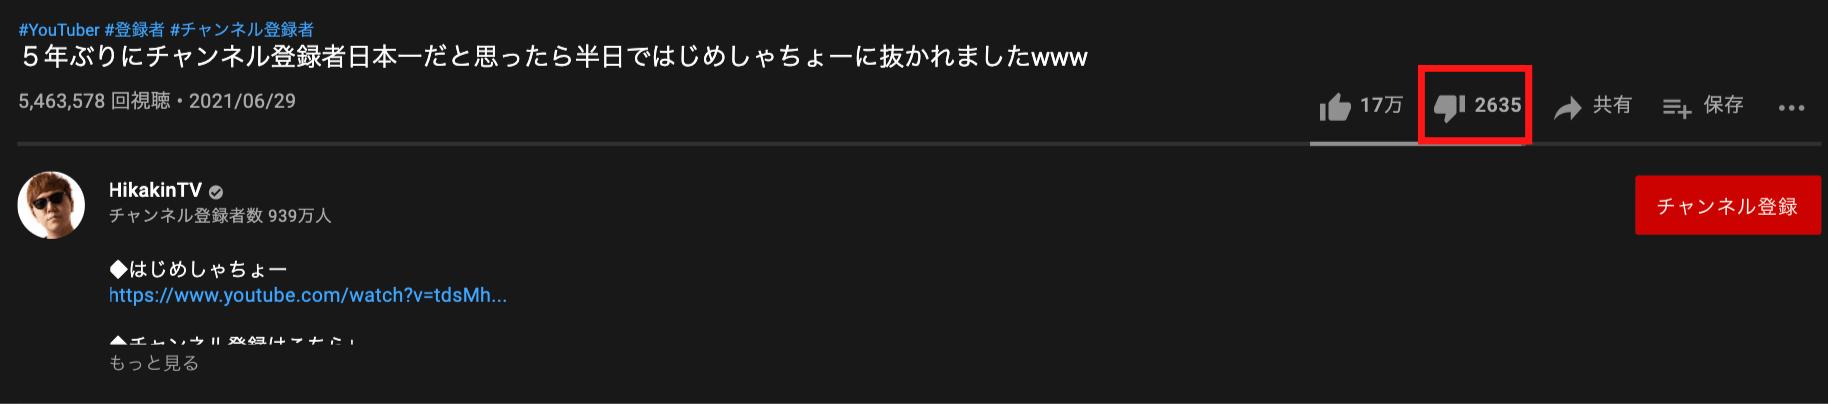 youtube-hikakin-Low rating